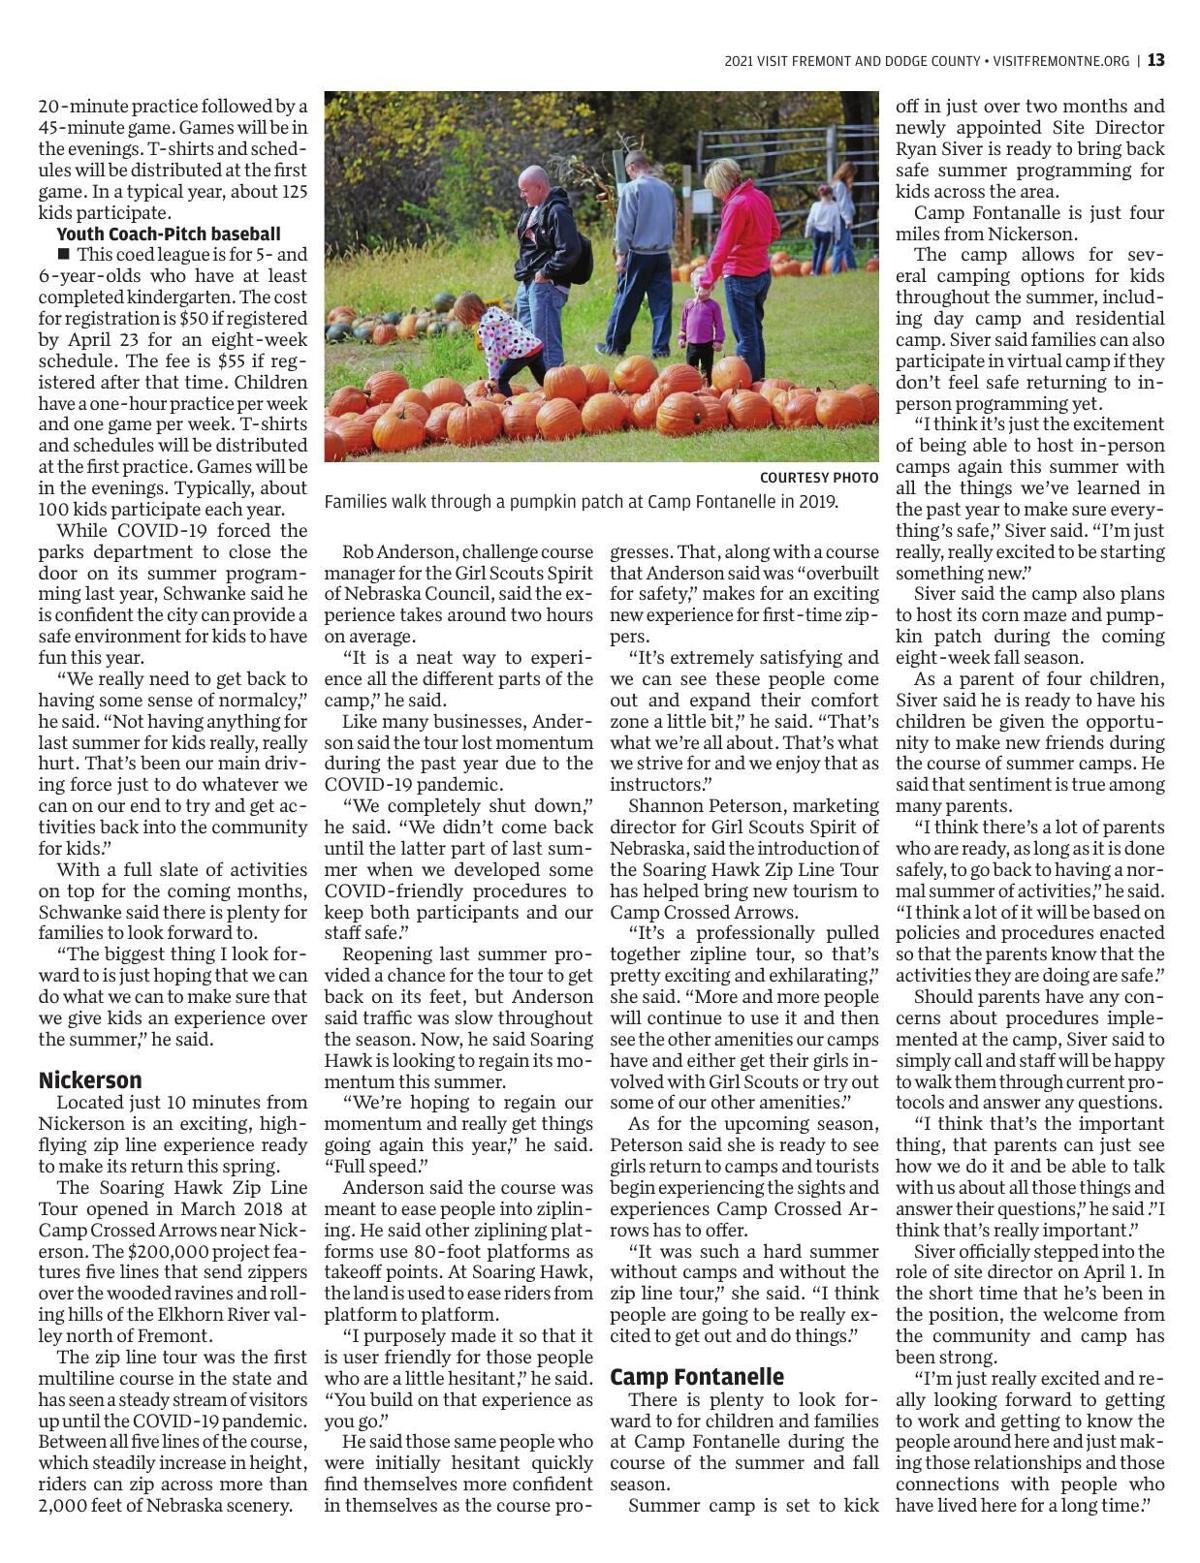 Visit Fremont and Dodge County 2021 13.pdf